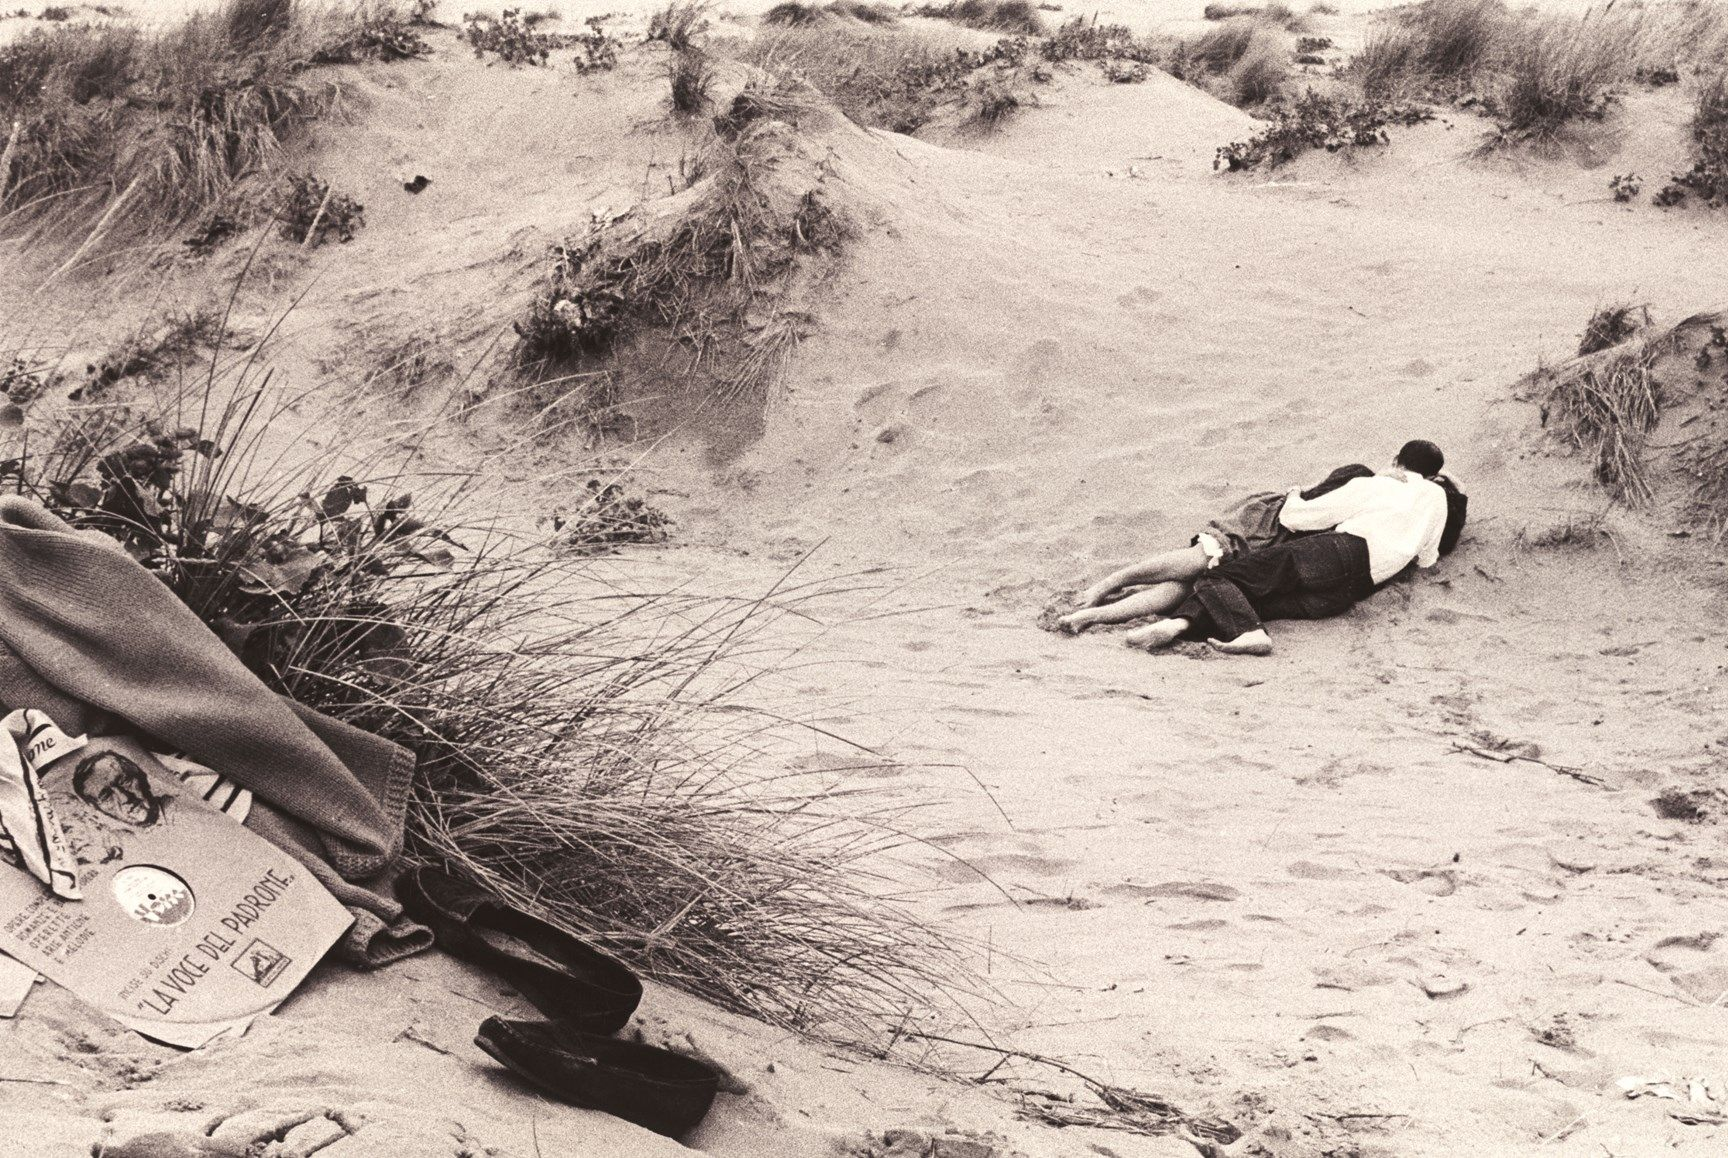 Gianni Berengo Gardin, Venezia. Il lido, 1958 © Gianni Berengo Gardin - Courtesy Fondazione Forma per la Fotografia